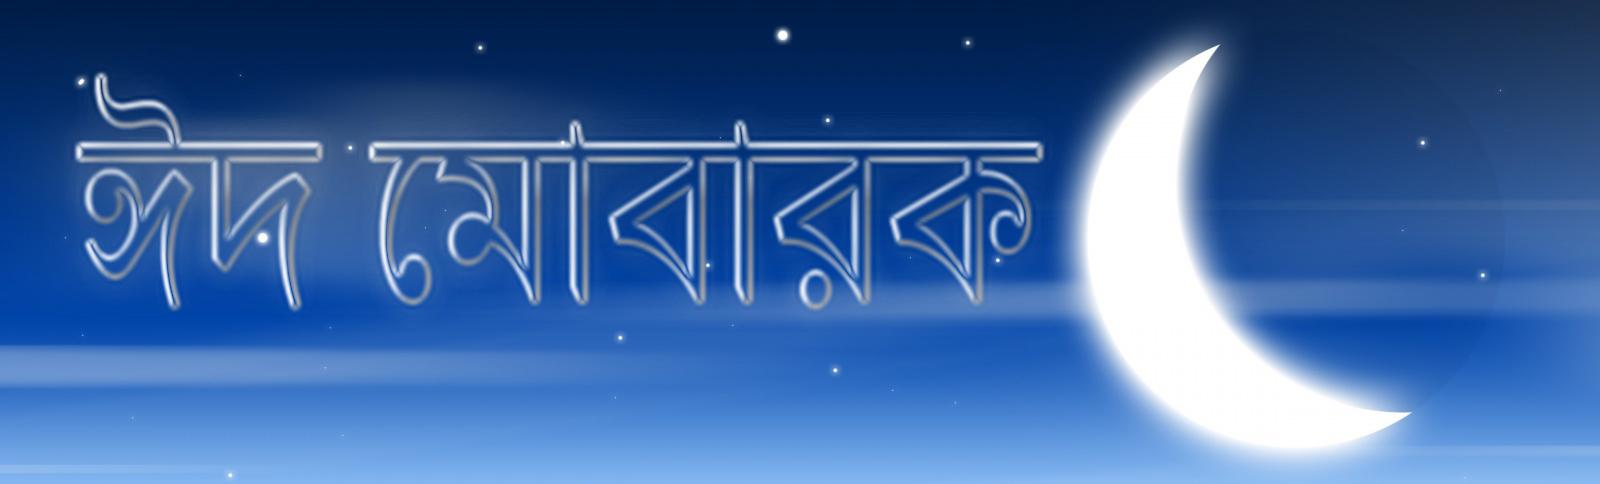 Bangla Eid SMS, bangla eid mubarak or Eid ul adha greeting